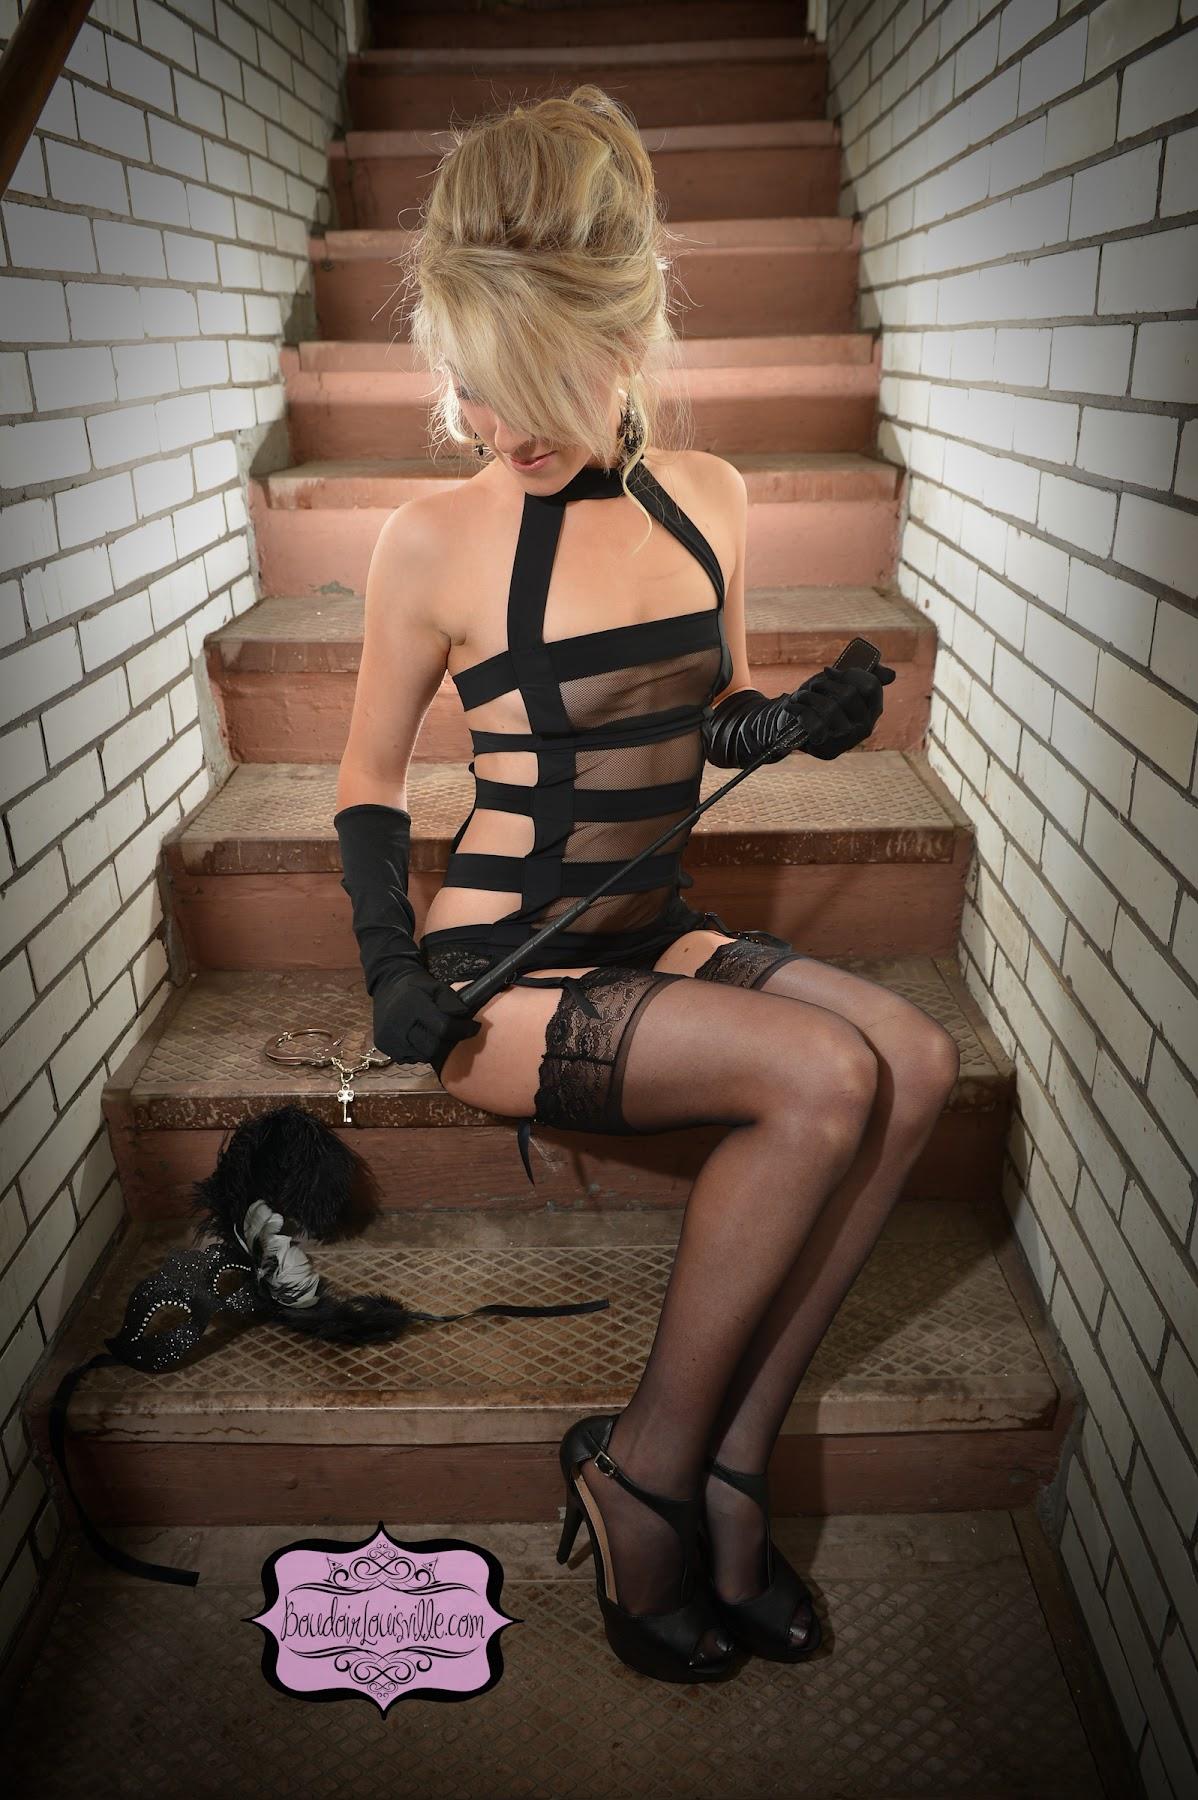 http://3.bp.blogspot.com/-nA5LZvSF7bc/UHwfsYUAgbI/AAAAAAAAJI0/QyP6phXEjD8/s1800/50+shades+of+gray+boudoir+photo+shoot+-+Boudoir+Louisville-7.jpg